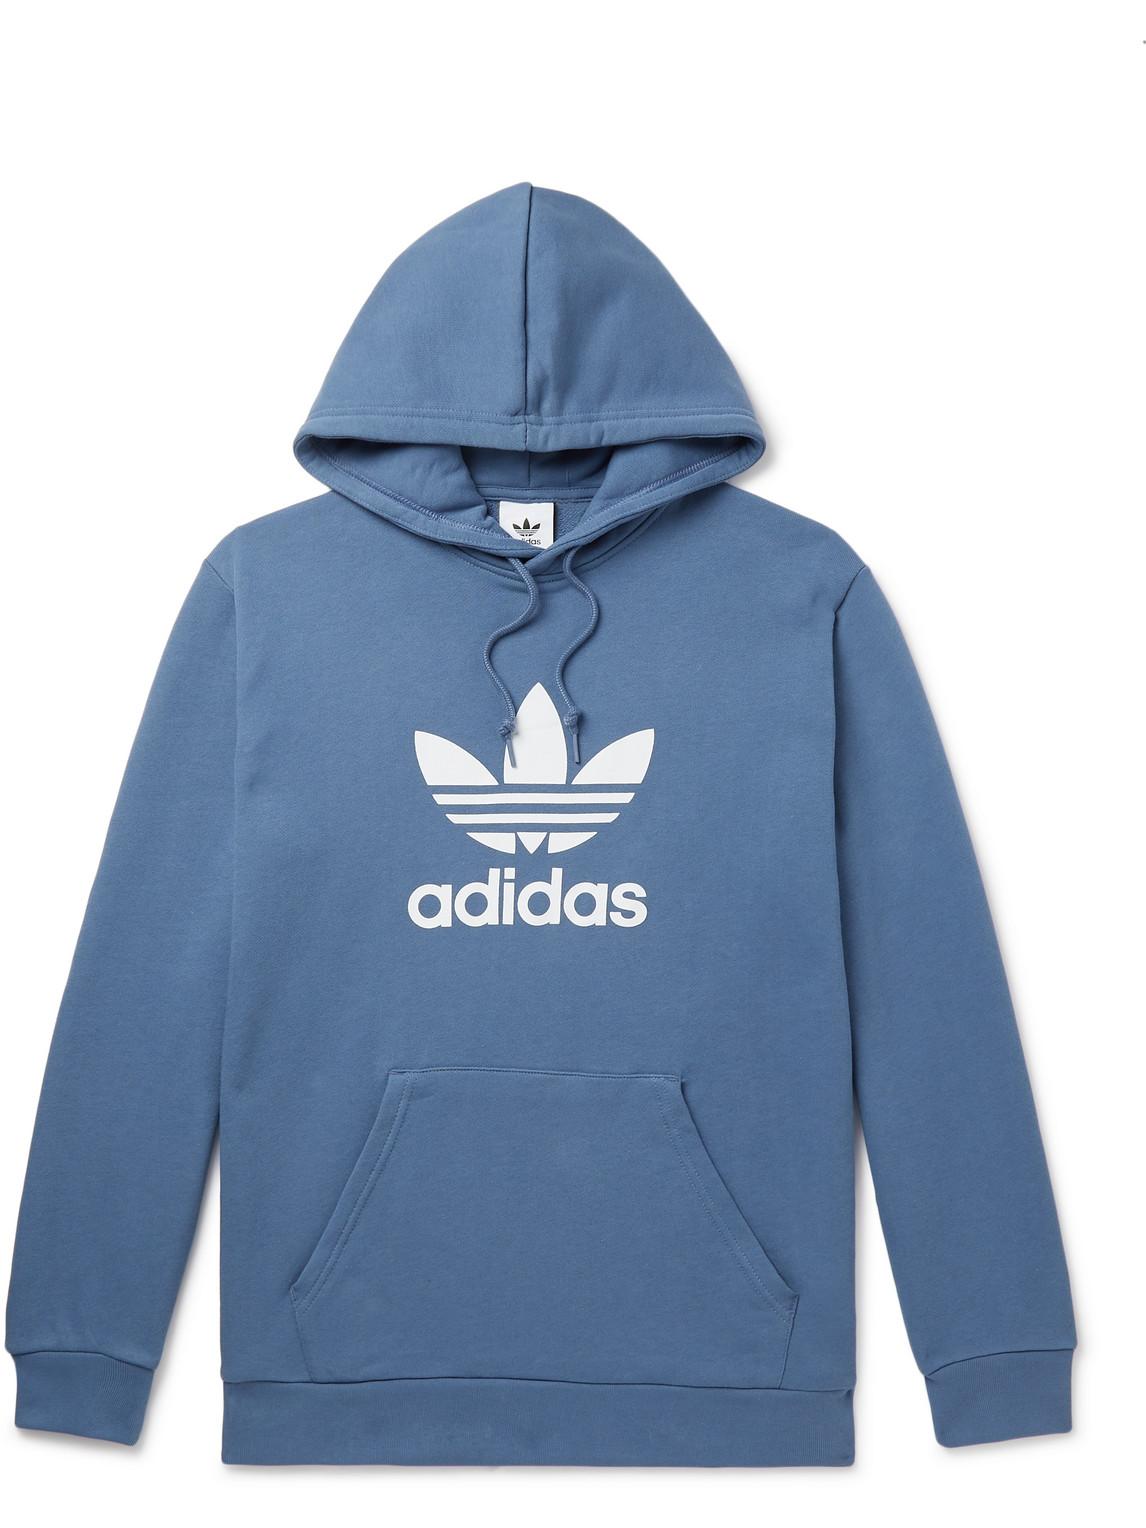 Adidas Originals Logo-print Cotton-jersey Hoodie In White | ModeSens